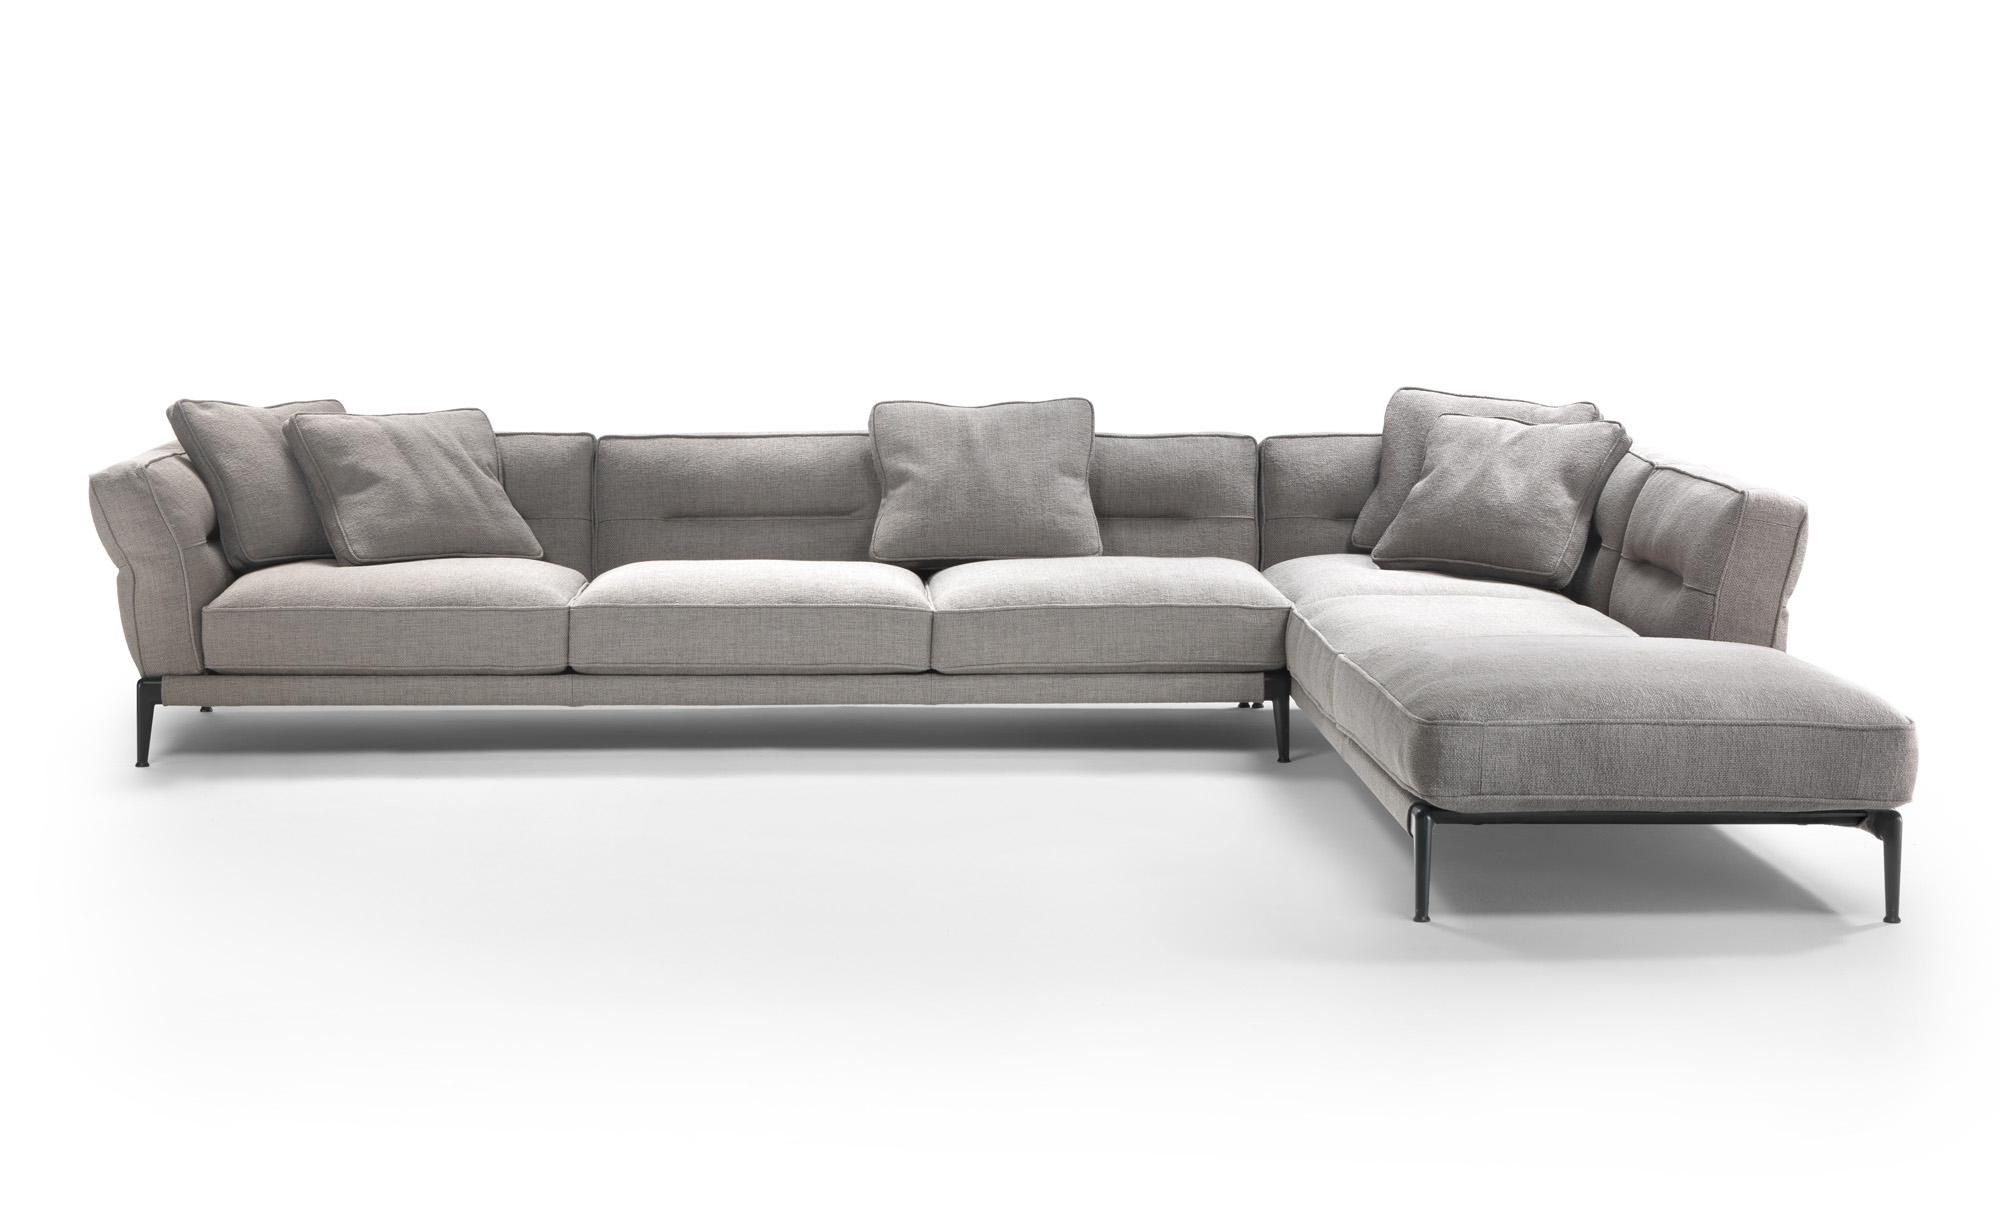 Modular Corner Sofas With 2018 Leather Sofas Fanuli Furniture Modular Corner Sofa Uk Nz And (View 17 of 20)